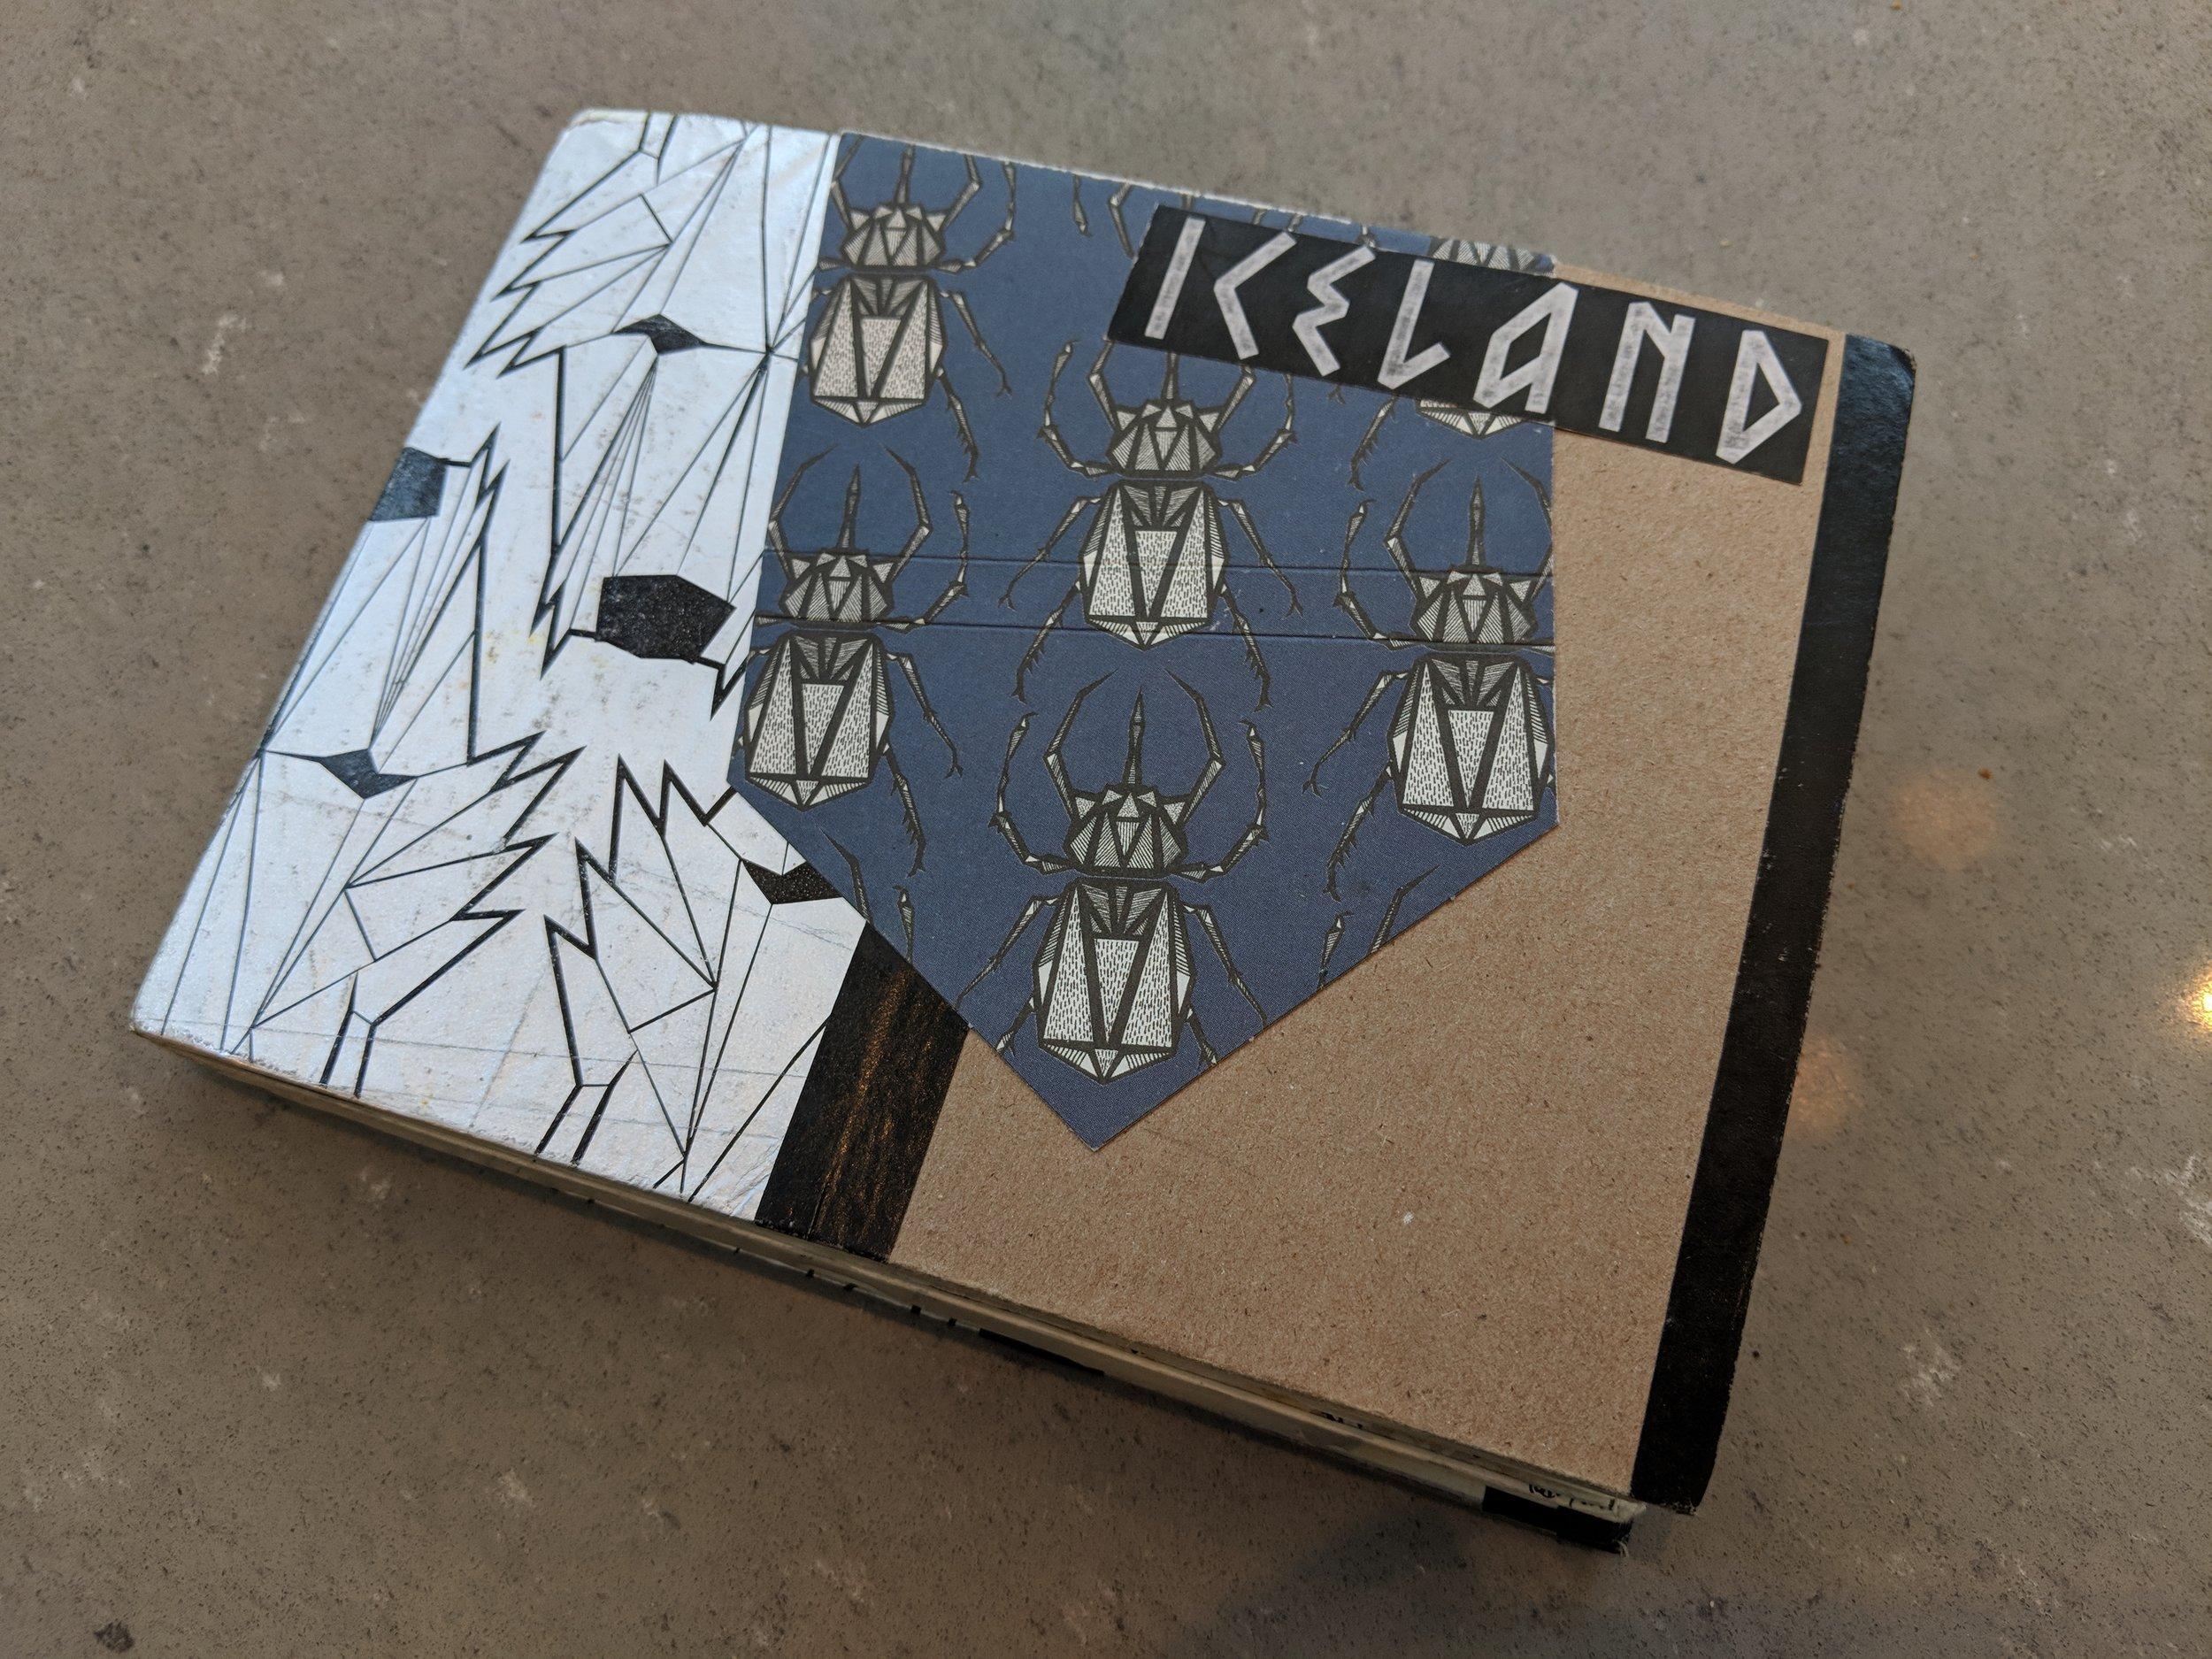 Iceland Journal